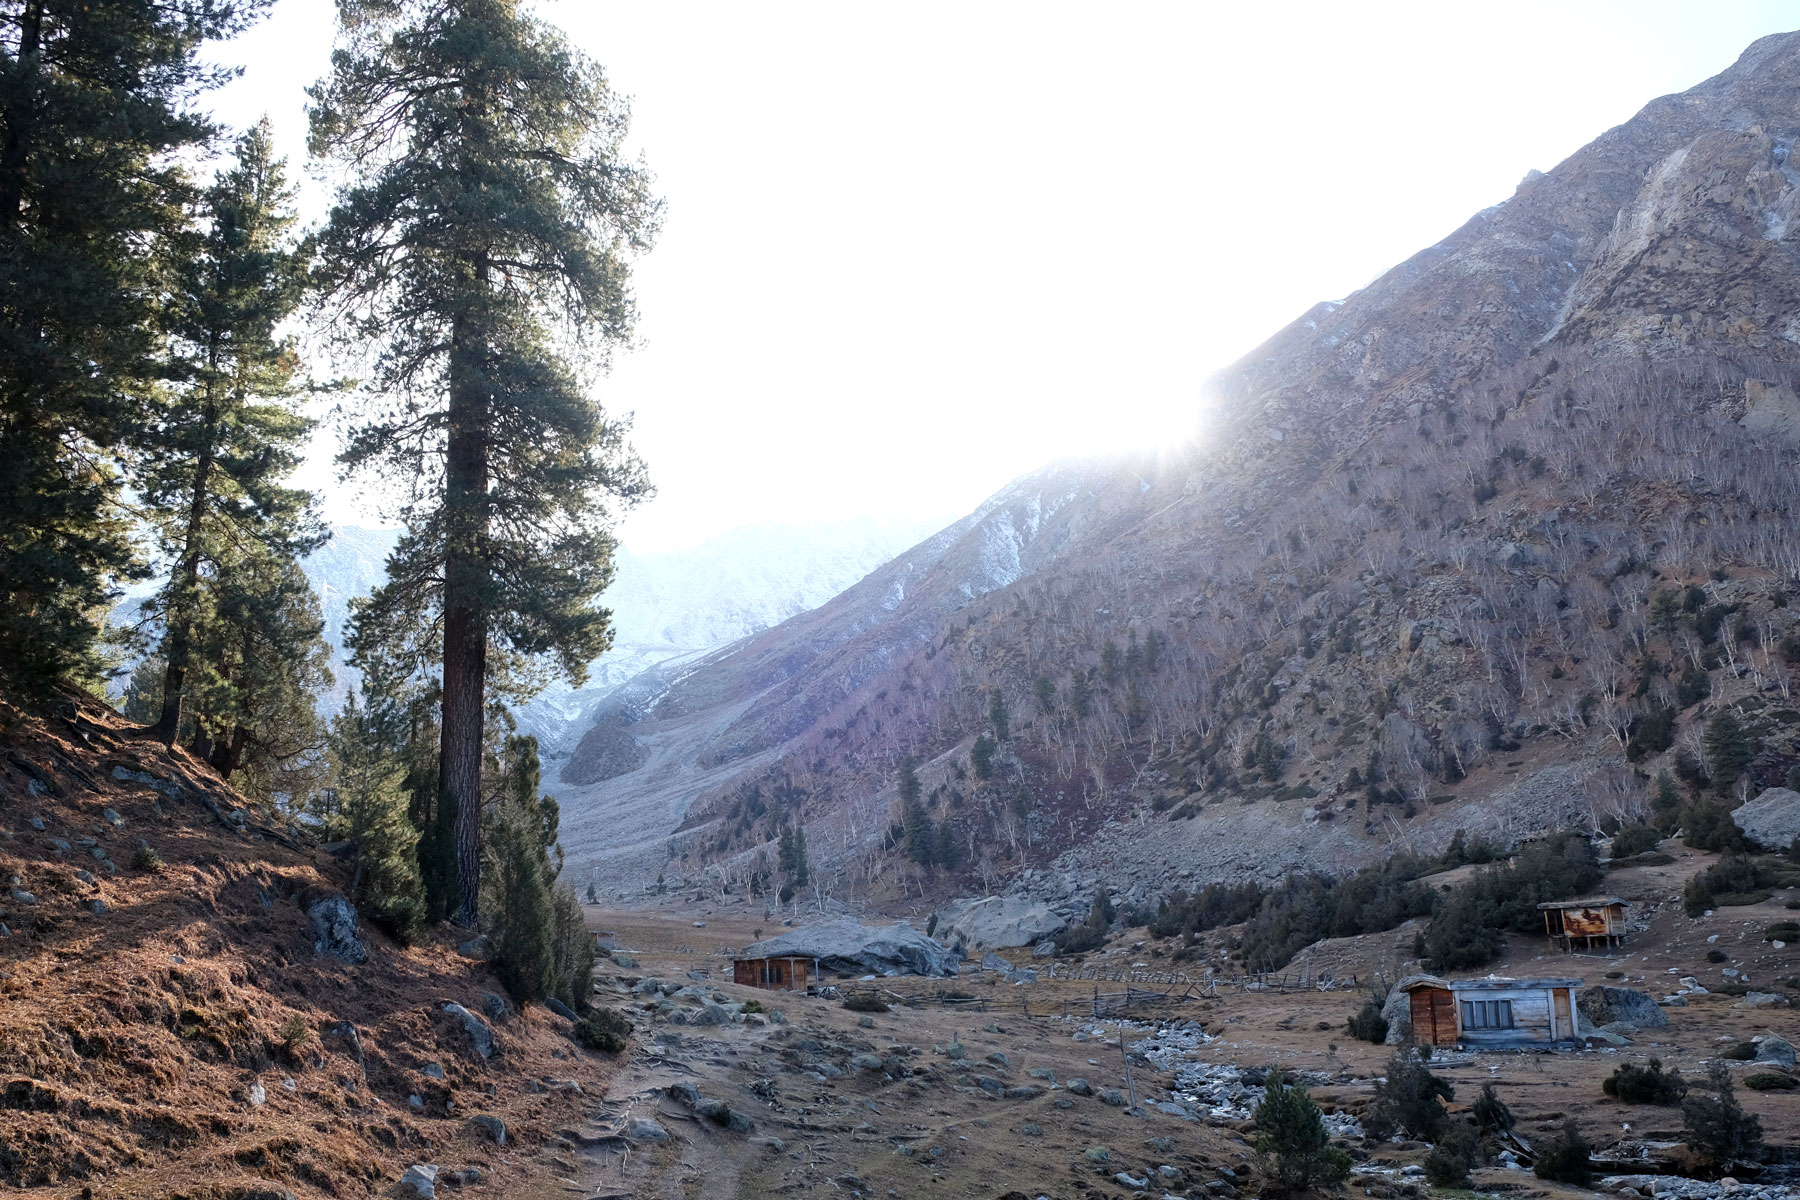 Hütten im Gebirge.